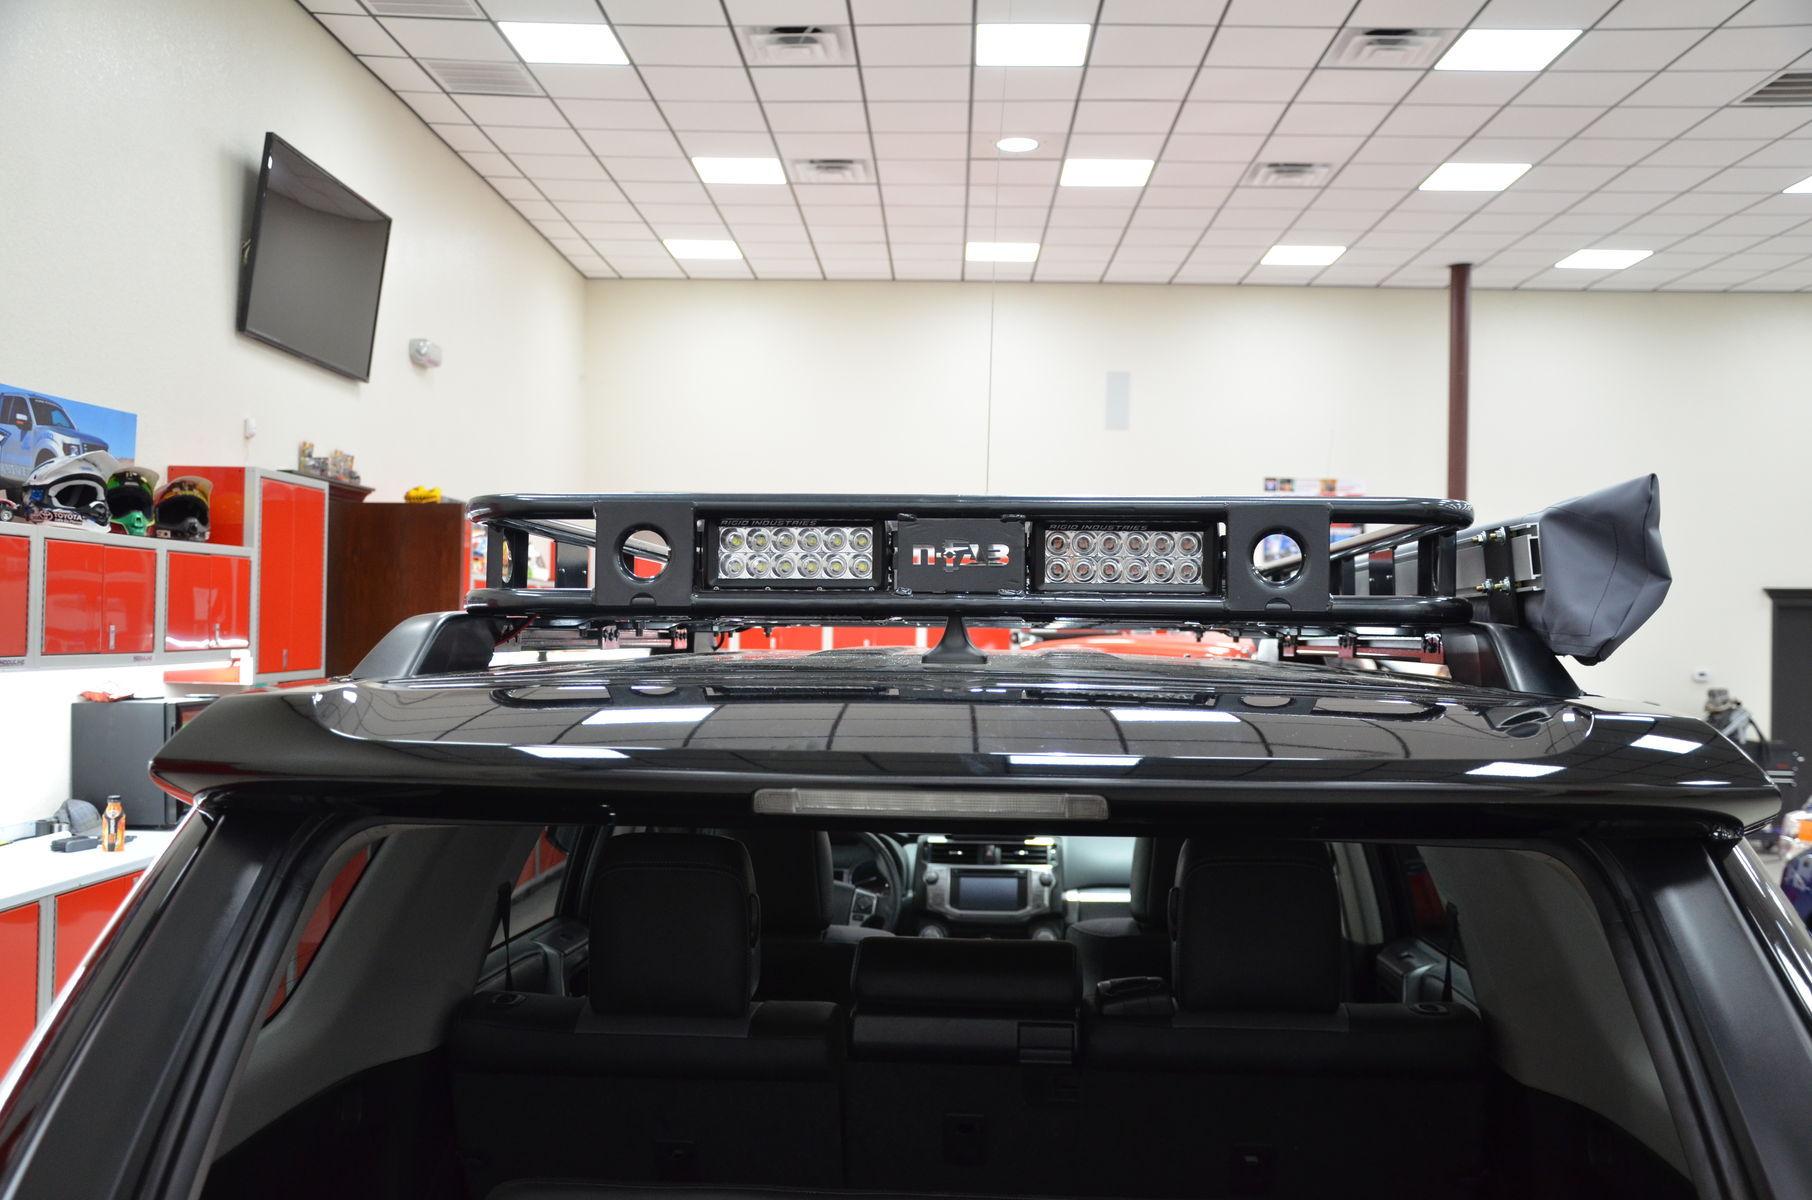 2014 Toyota Tundra | N-FAB TRD PRO Build - Toyota Tundra Light Bar